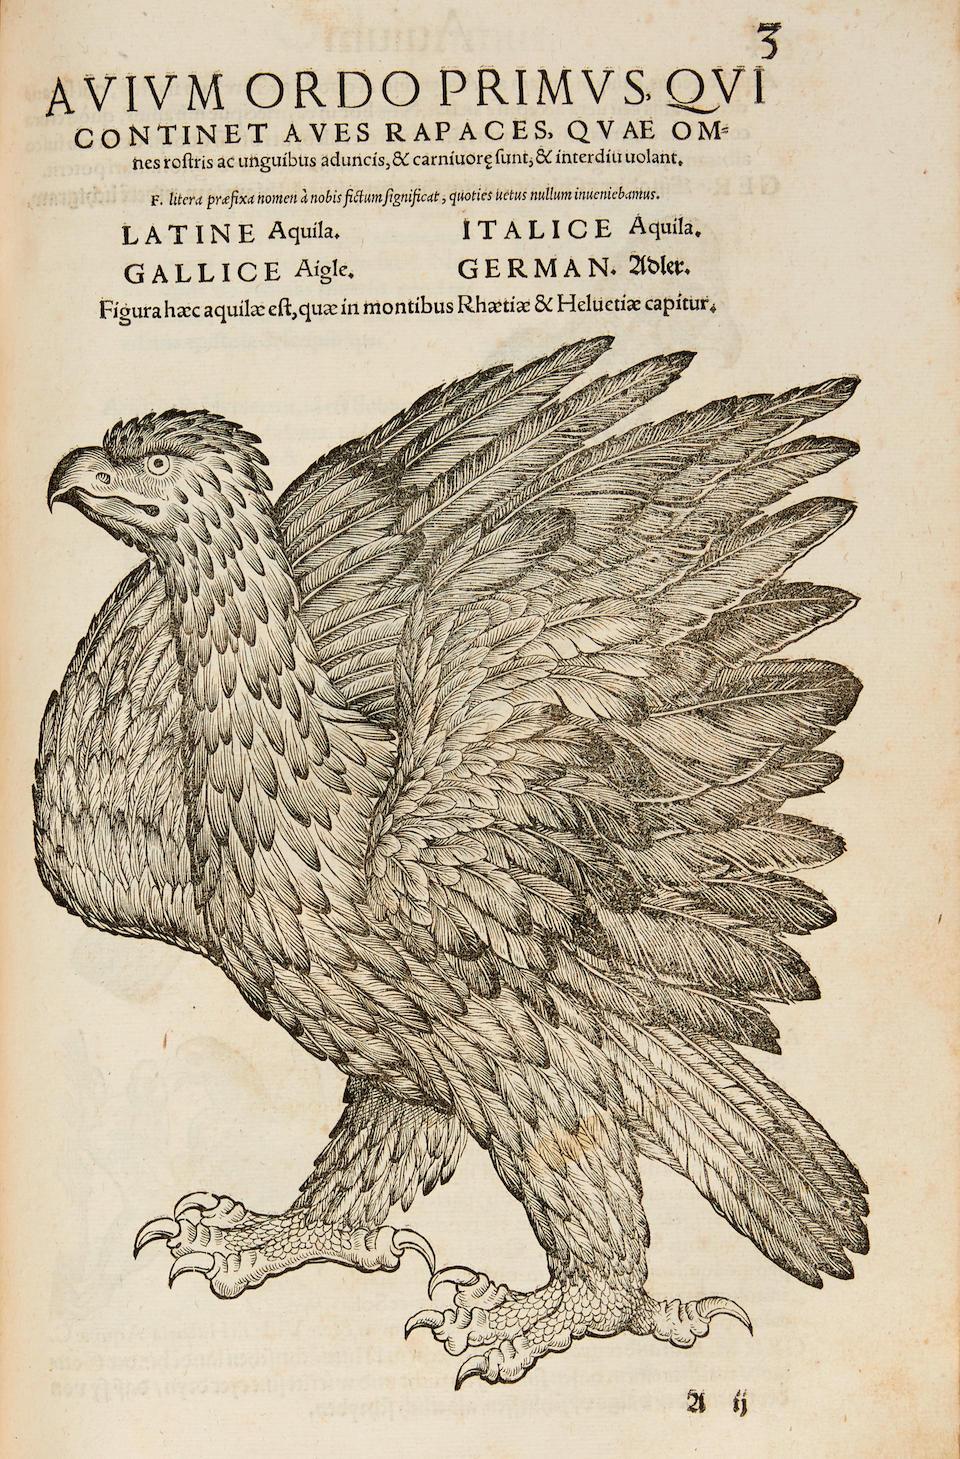 GESNER, CONRAD. 1519-1565. Icones avium ordo primus. Zurich: Christopher Froschauer, 1560.